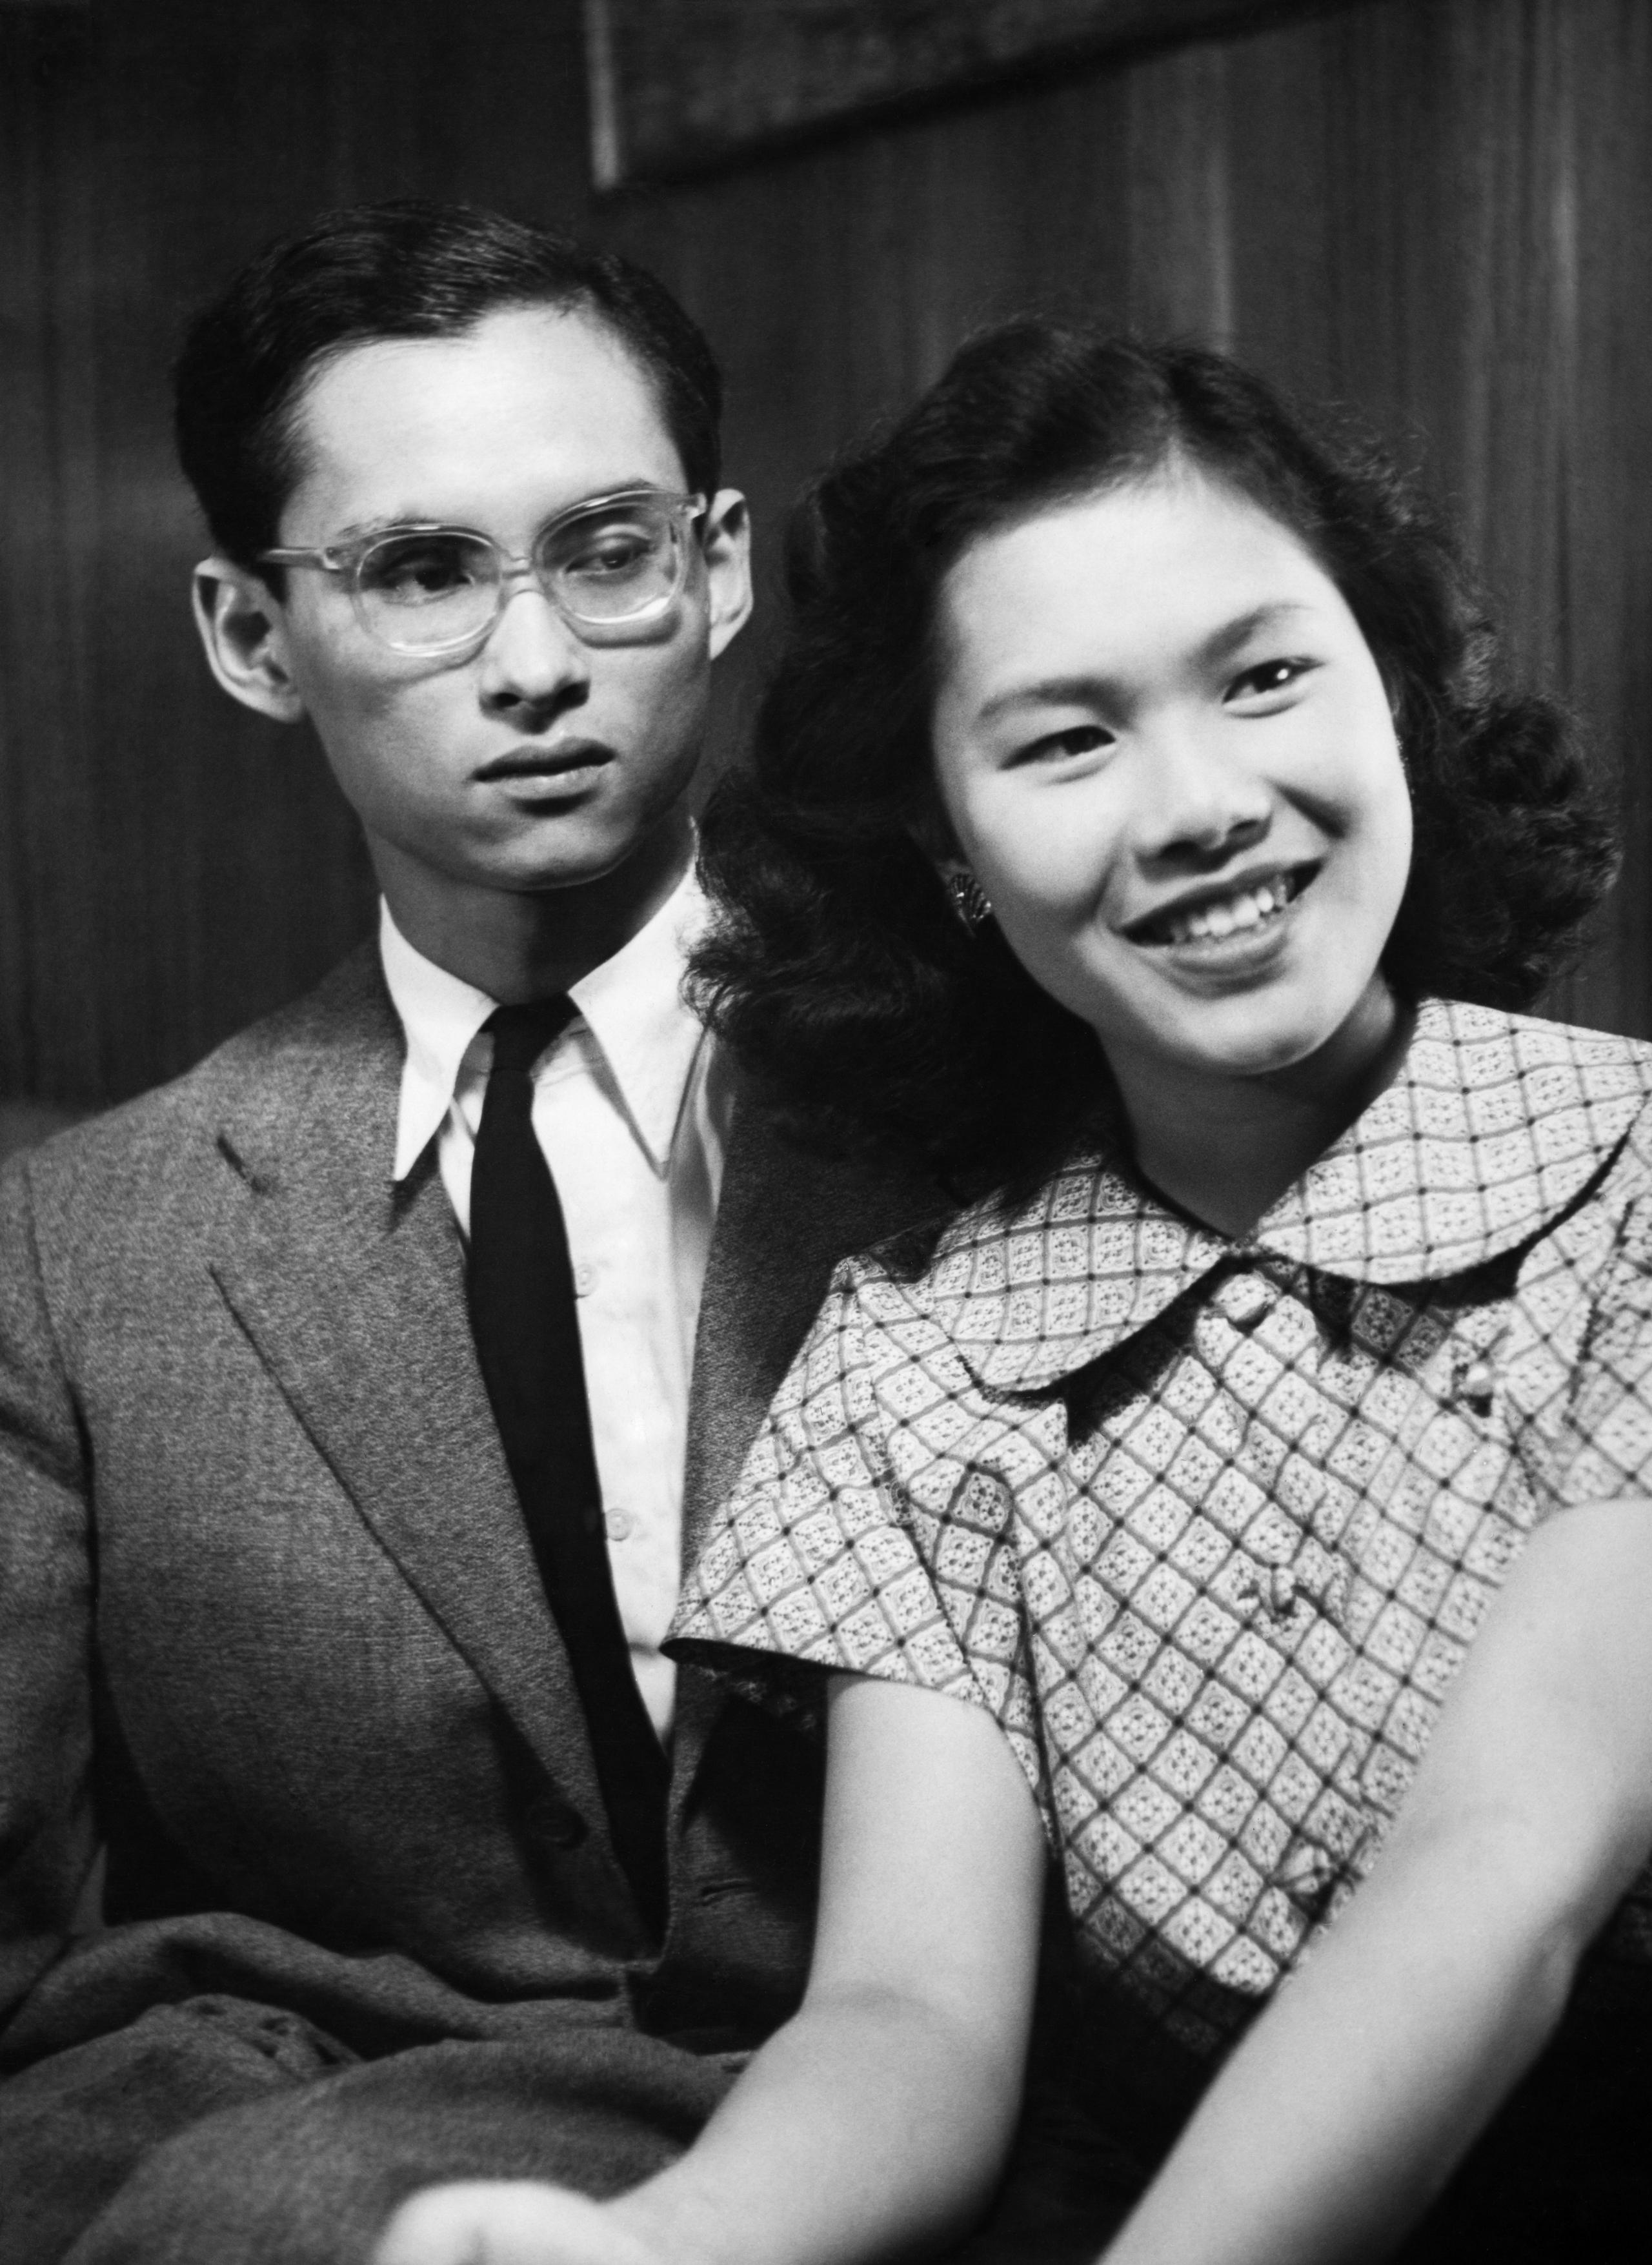 King Bhumibol Adulyadej, 21, with his future wife Sirikit Kitiyakara, 17, in Pully, Switzerland, in 1949.